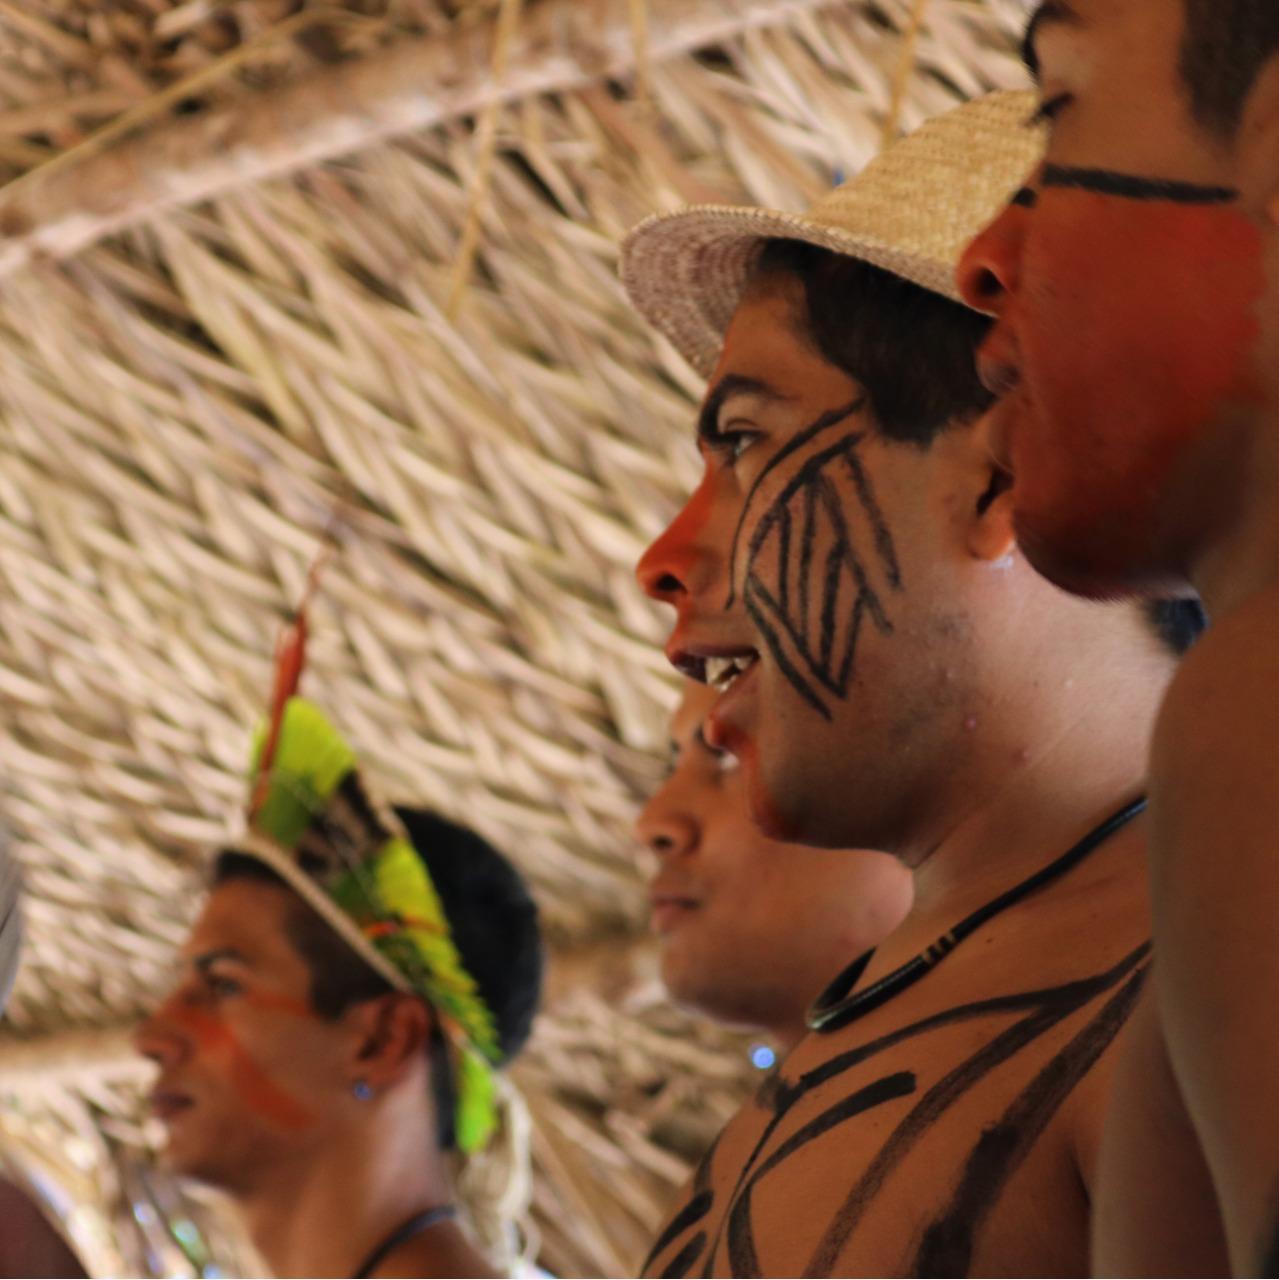 Indígenas Fulni-ô, resistentes à seca do sertão, pedem socorro na pandemia do coronavírus